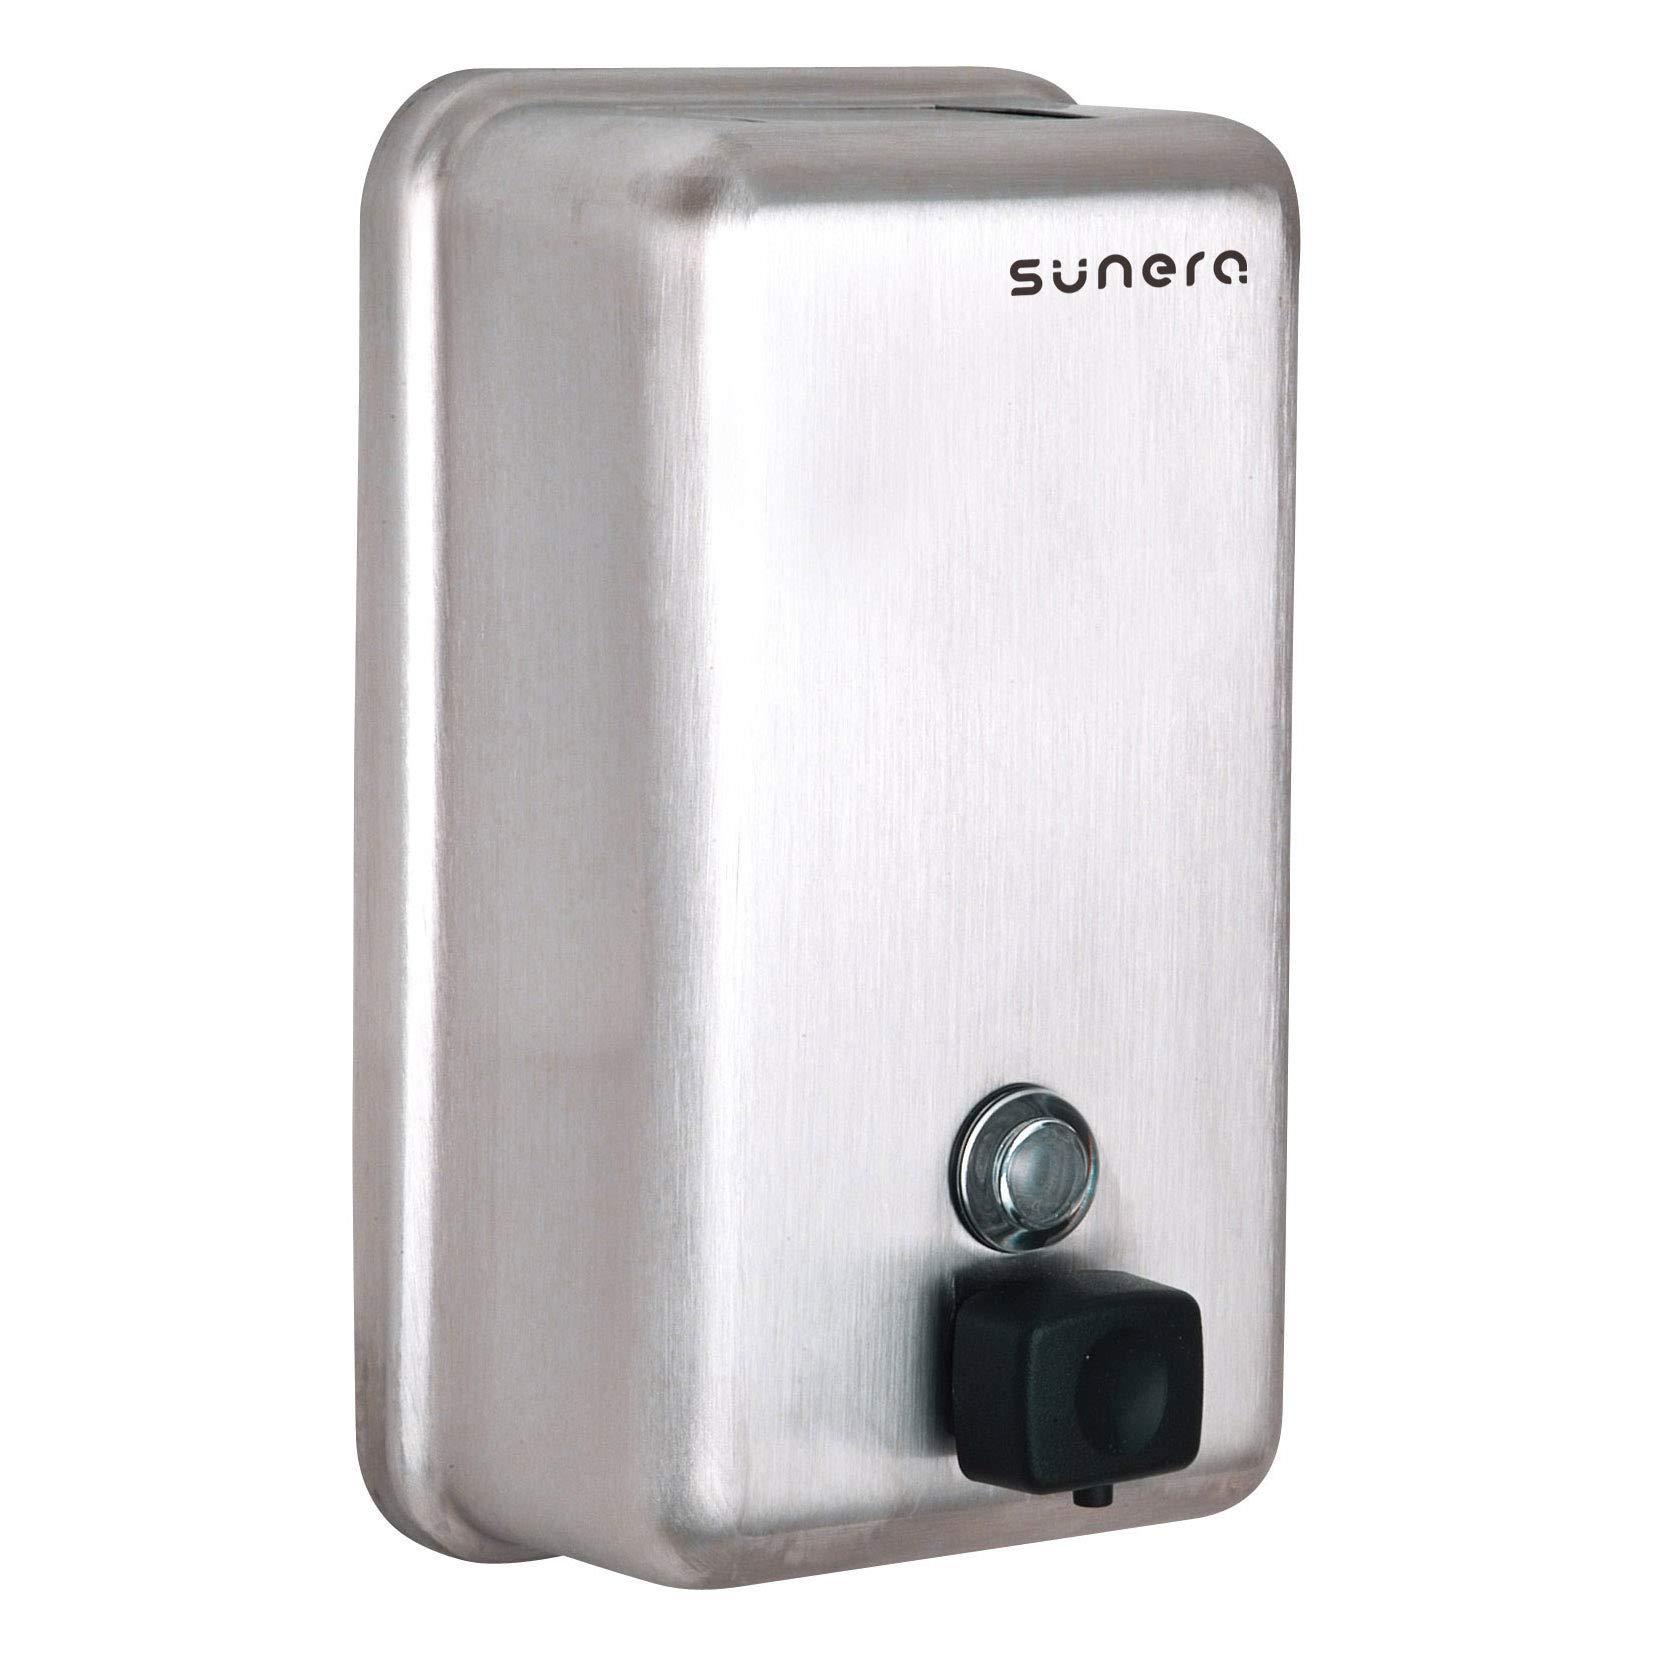 Sunera Vertical Liquid Soap Dispenser Black ABS Valve Stainless Steel Satin Finish 40oz/1200ml by Sunera